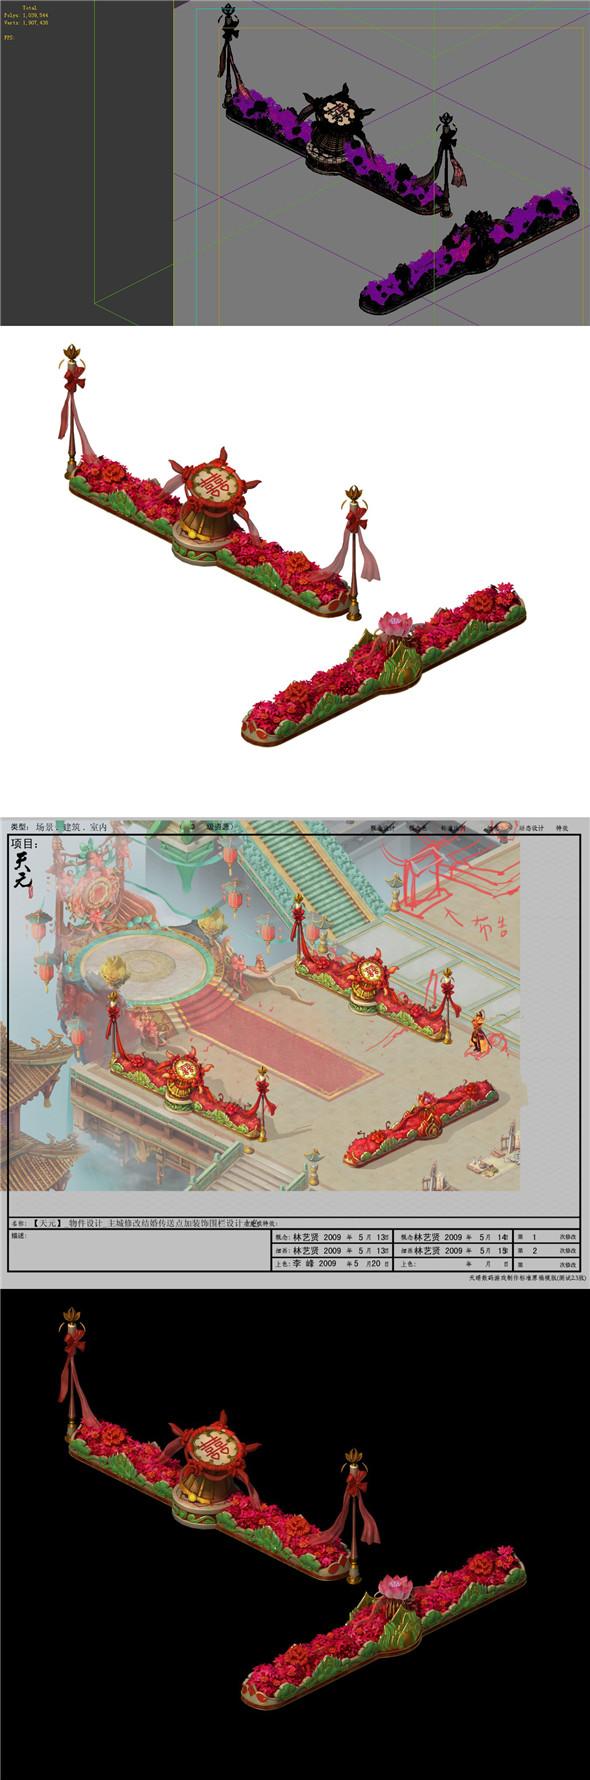 Game model - wedding garden - 3DOcean Item for Sale